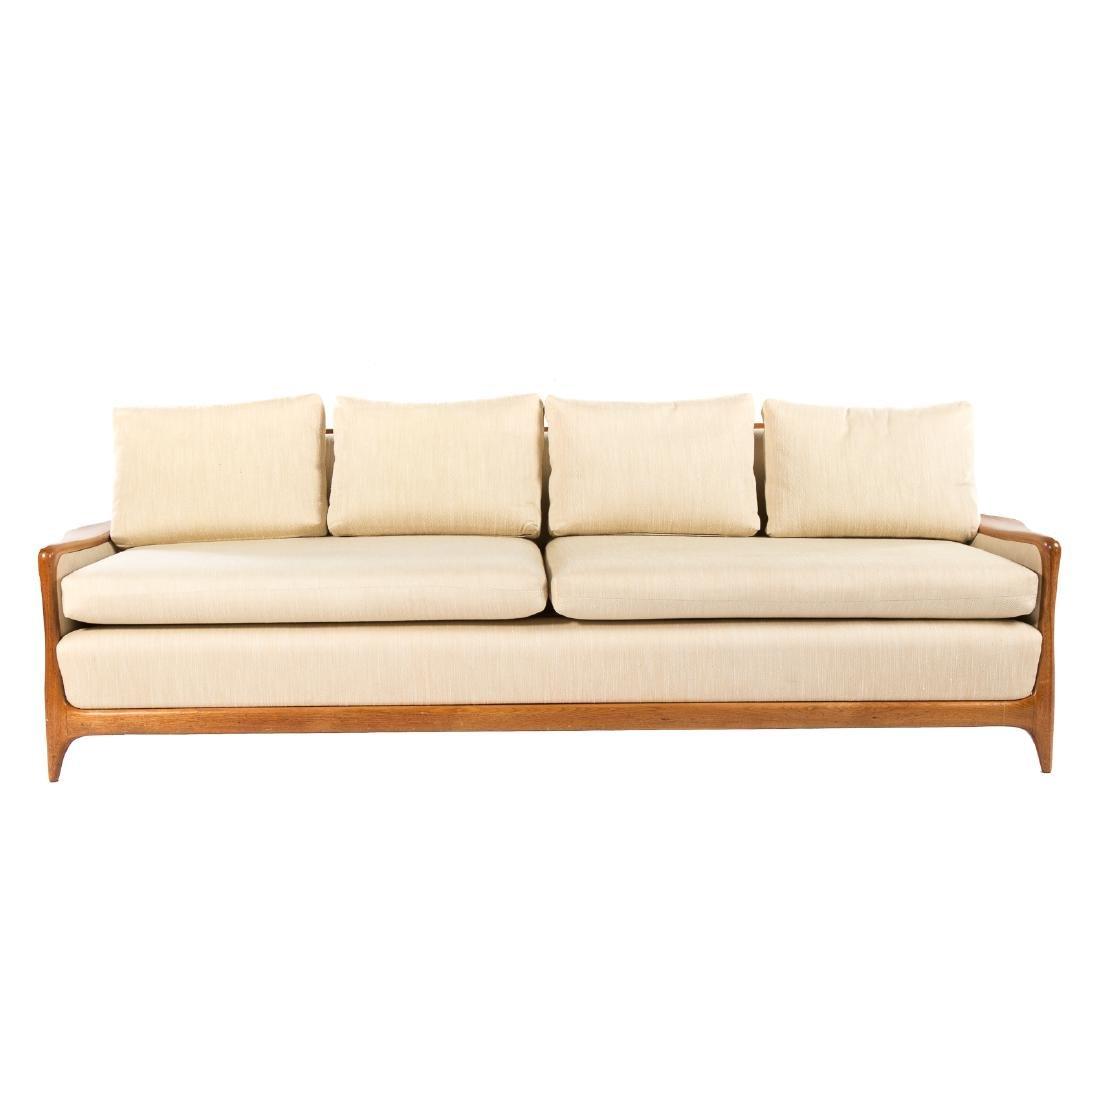 Vladimir Kagan - Dreyfuss walnut upholstered sofa